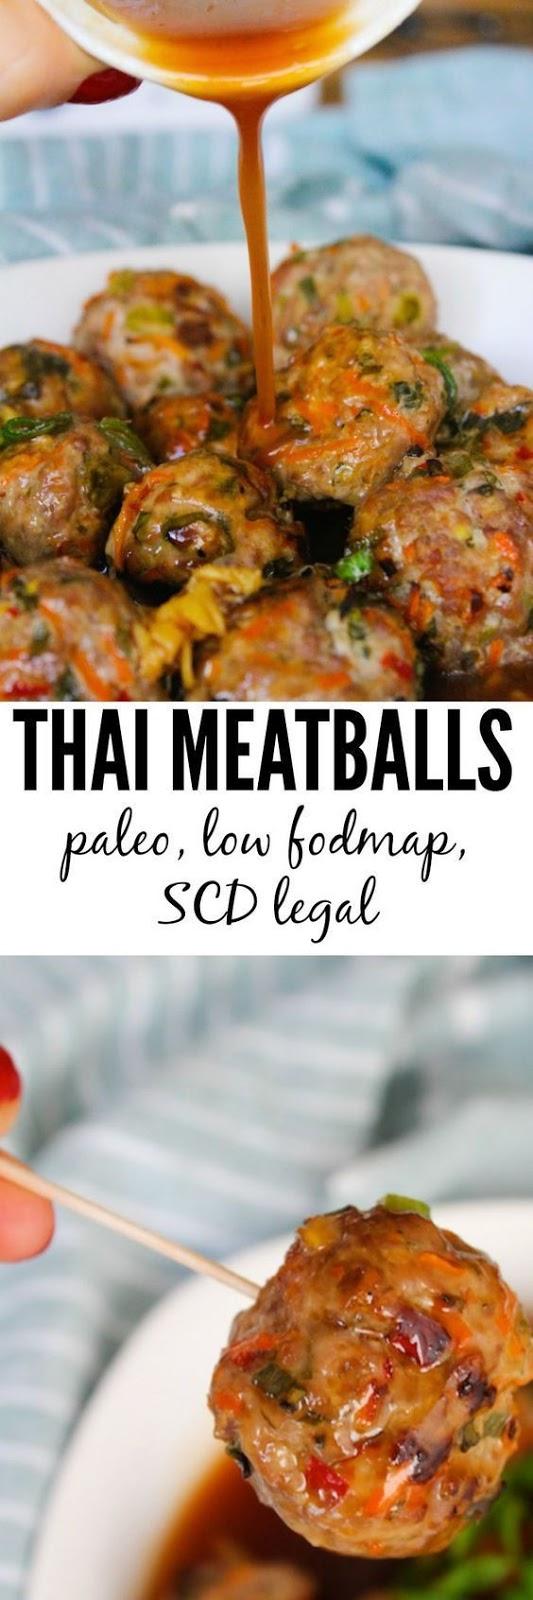 THAI MEATBALLS – PALEO & LOW FODMAP